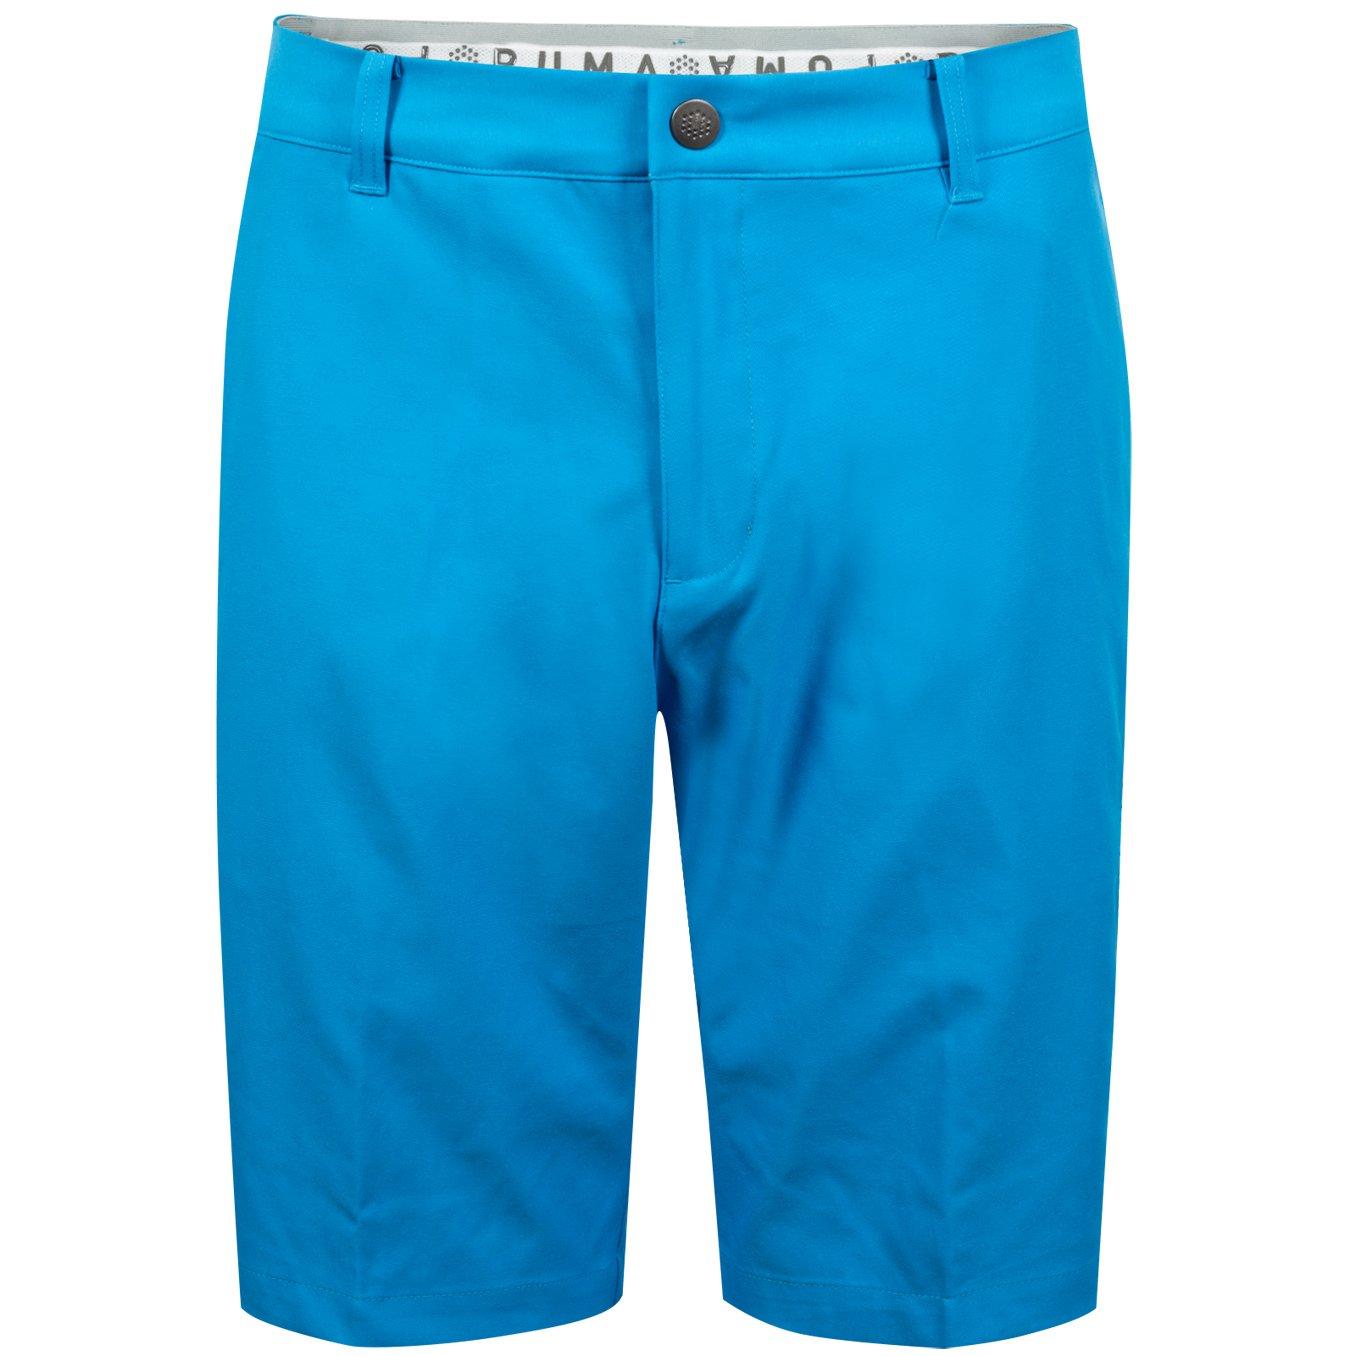 Puma Golf Jackpot Golfshorts Blue bell - Limited Edition